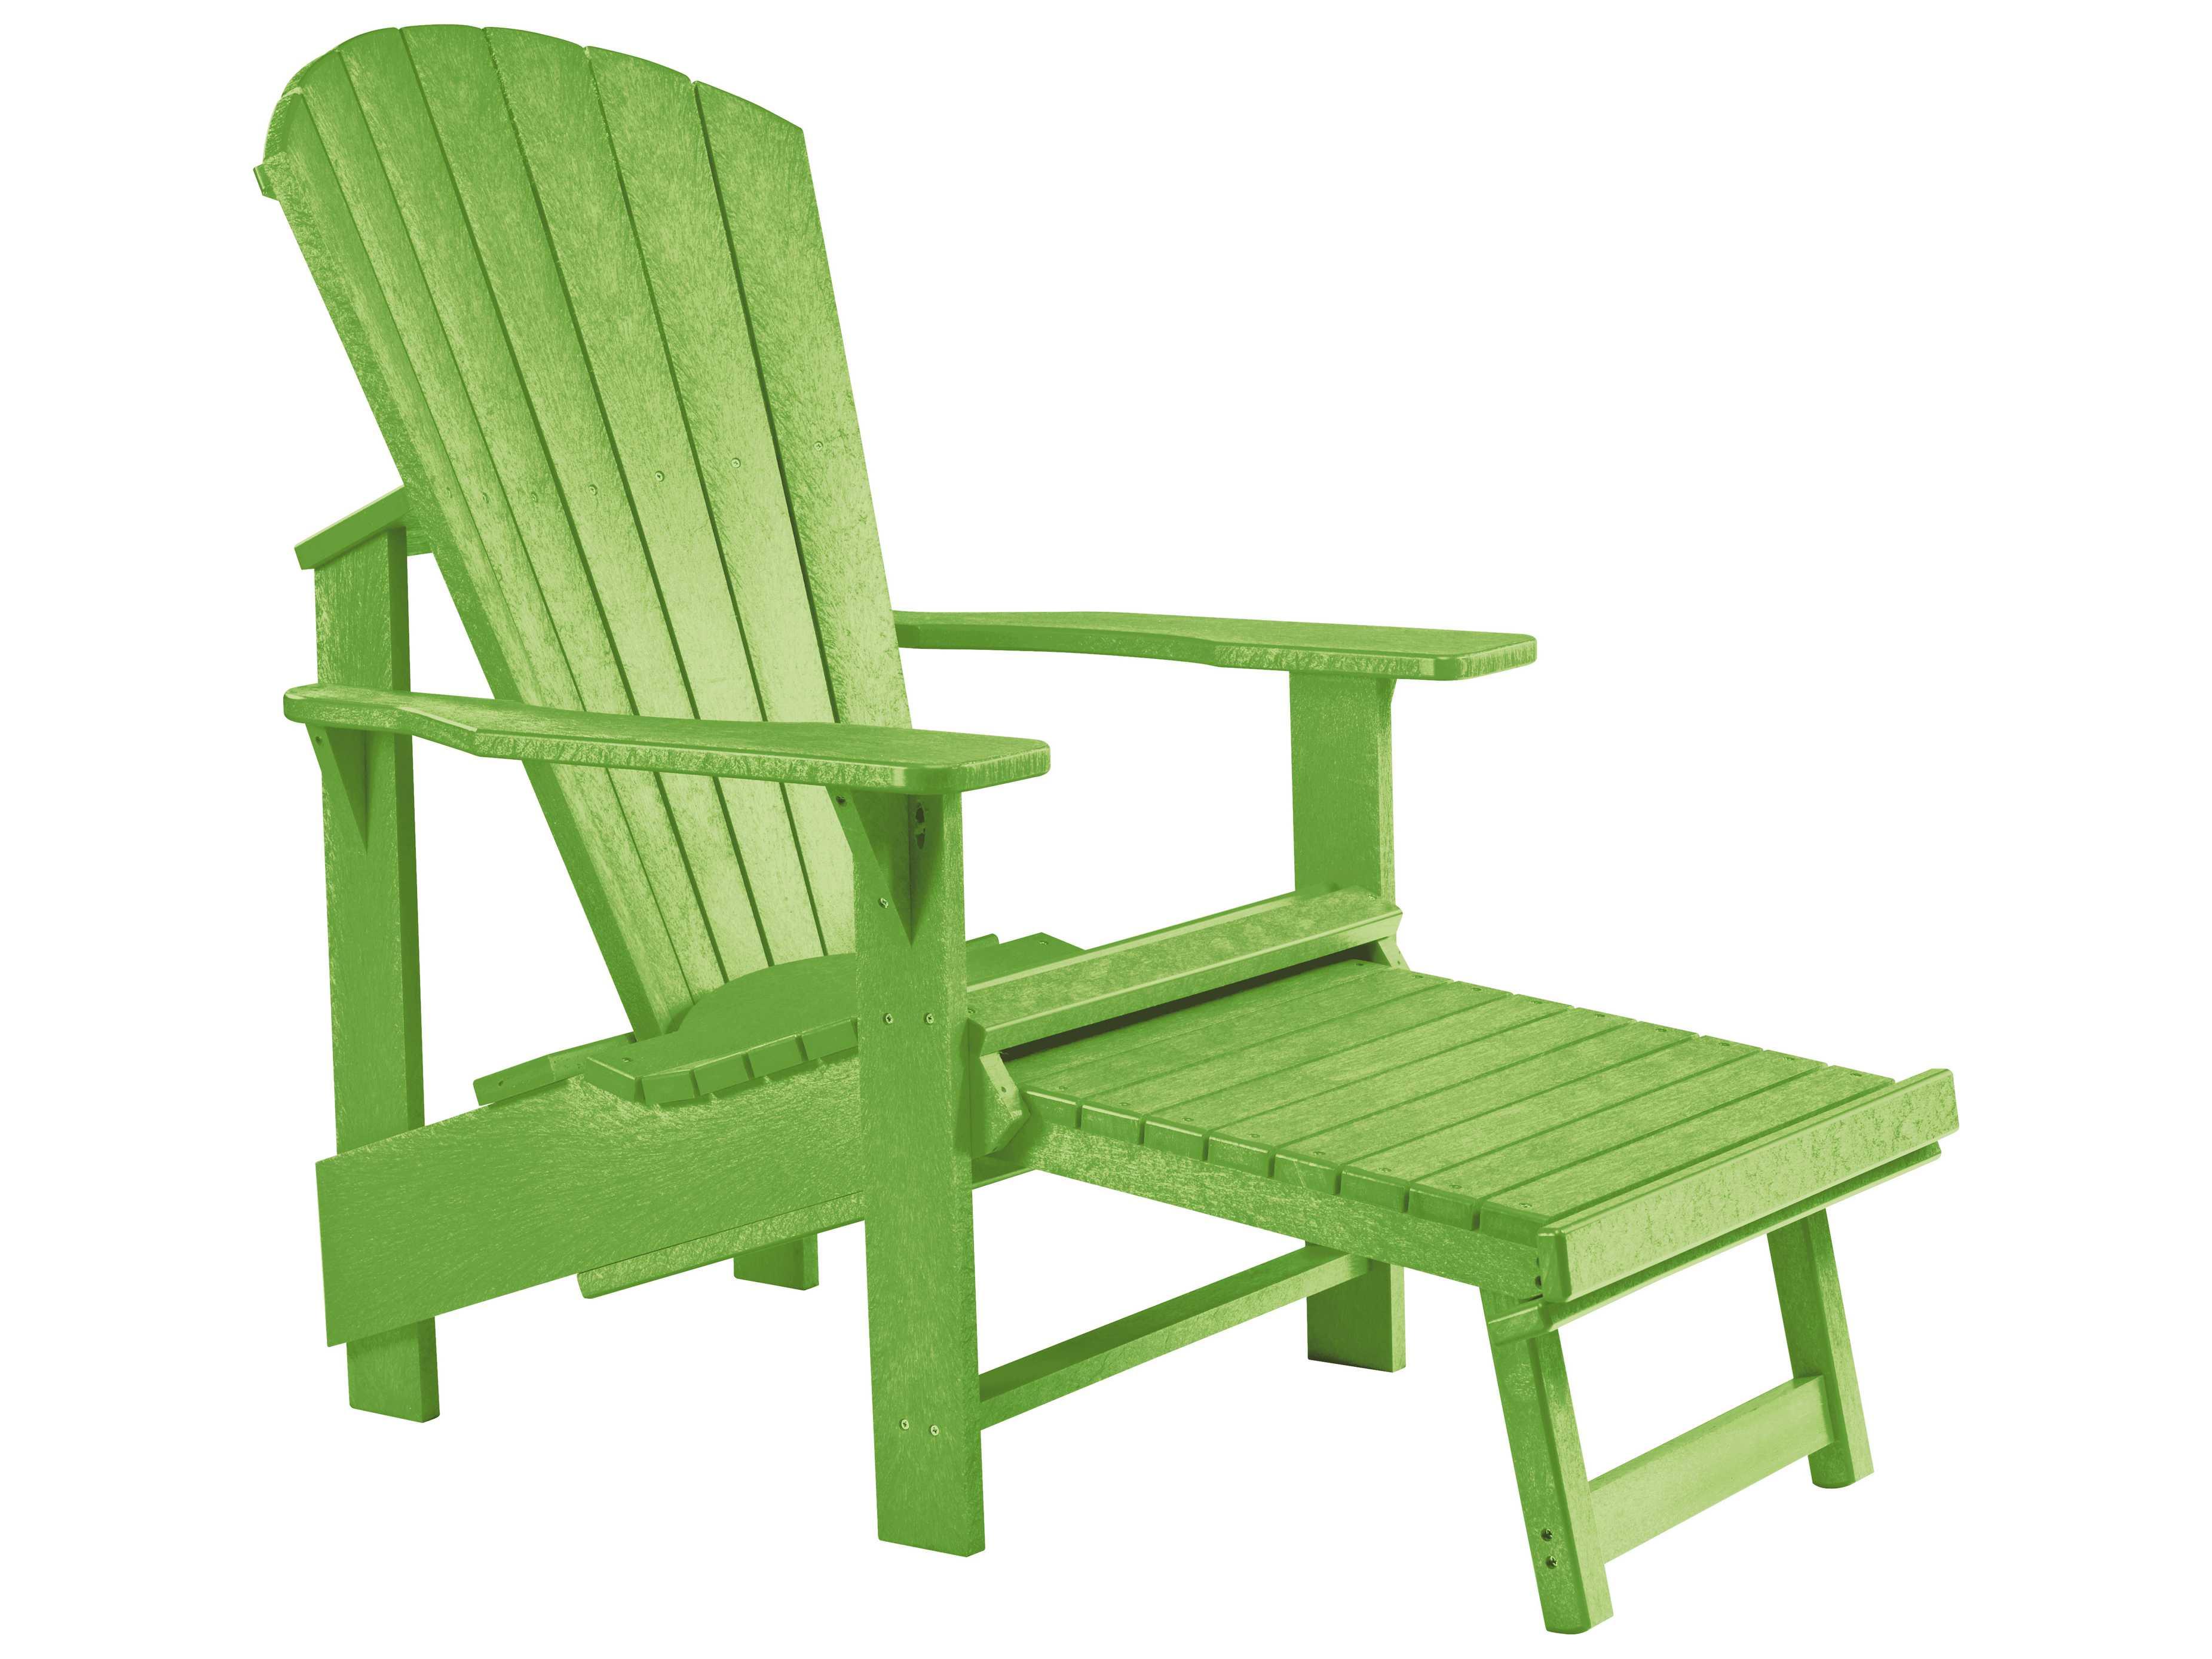 C r plastic generation recycled plastic adirondack upright chair crc03 - Chaise adirondack plastique recycle costco ...